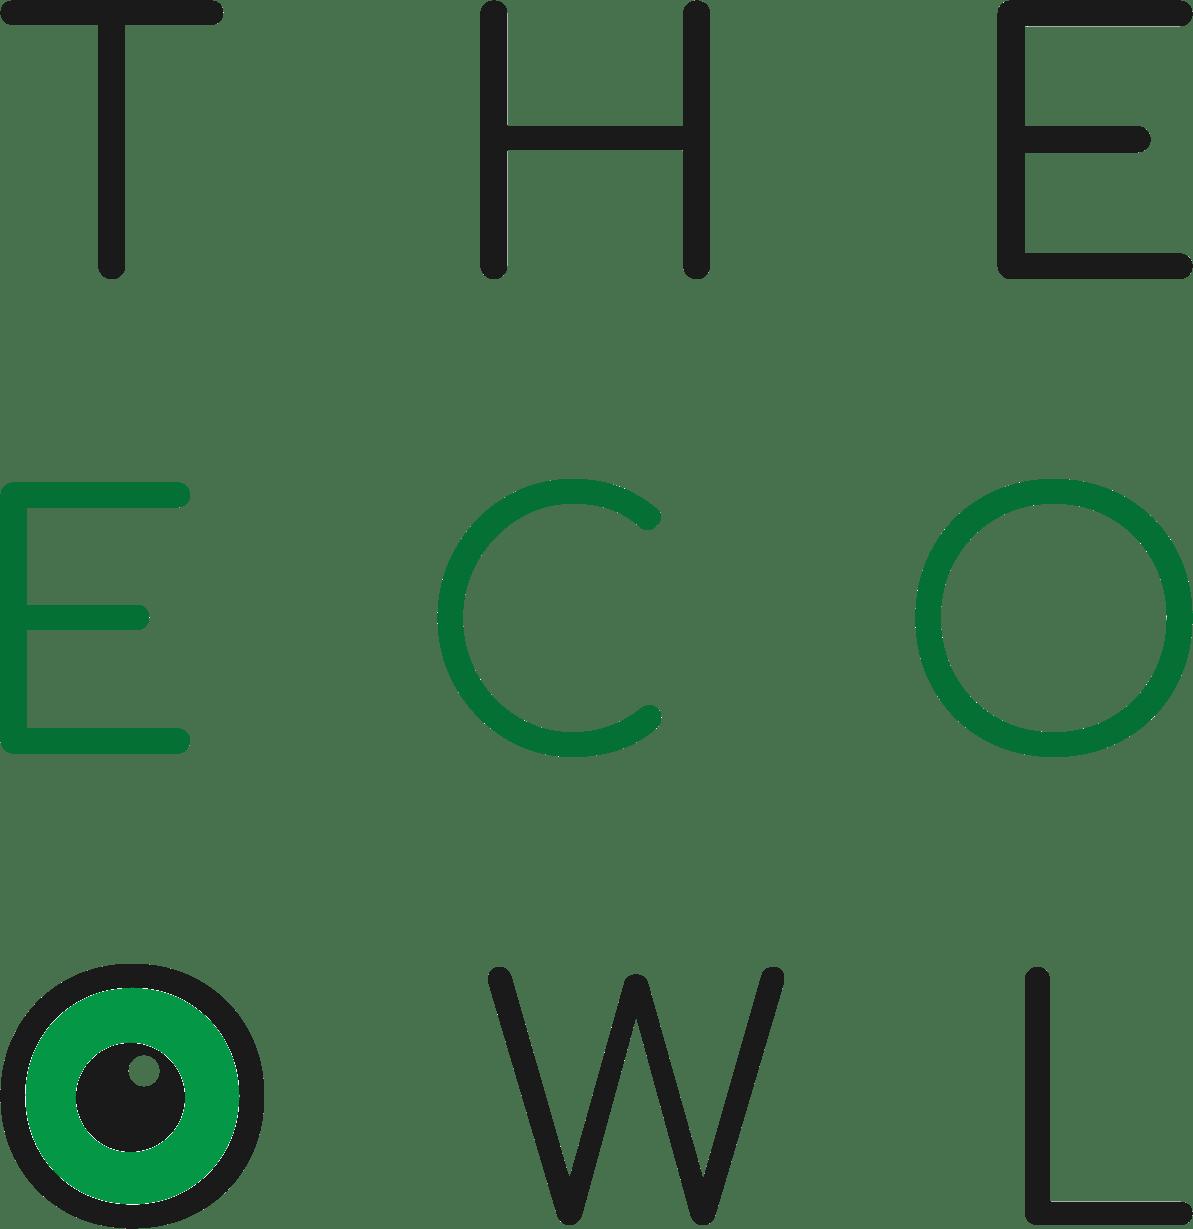 The Eco Owl